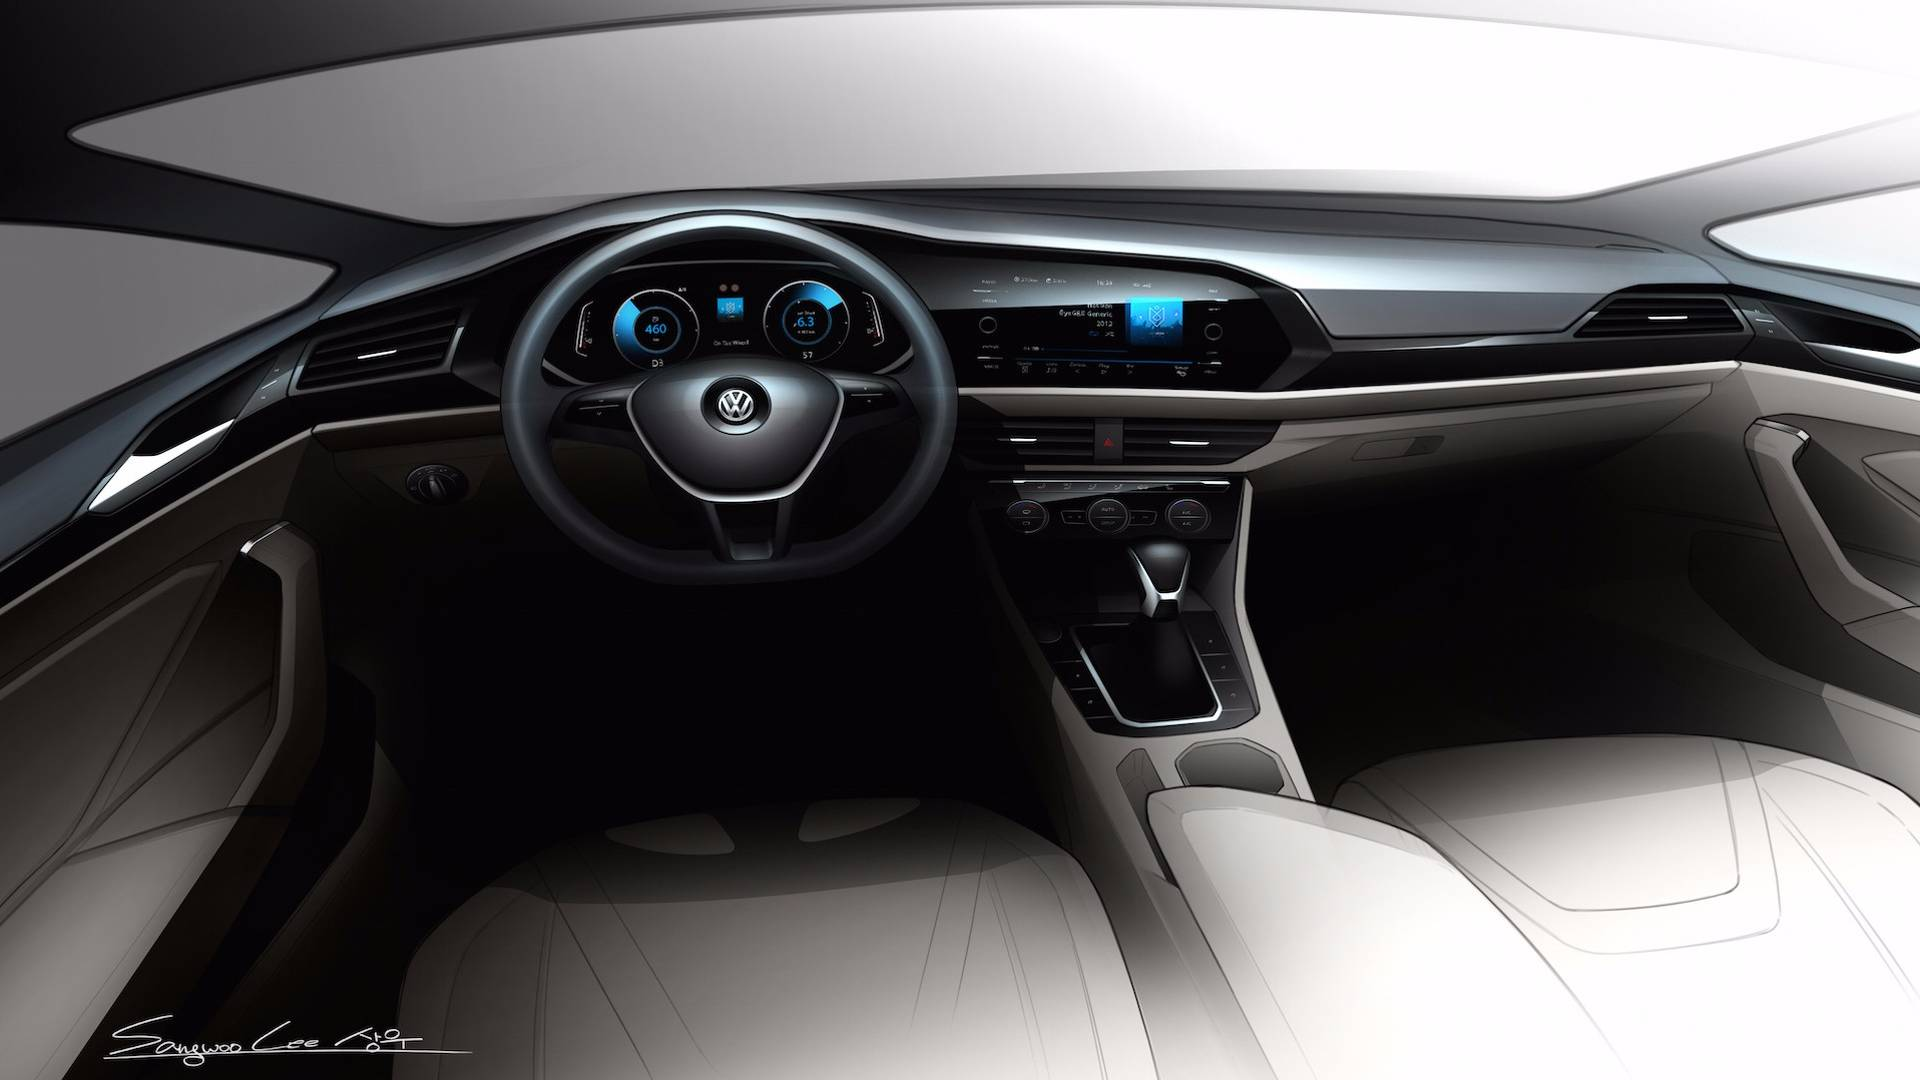 2017 Vw Jetta >> 2019 Volkswagen Jetta Interior Design Is a Massive Improvement - autoevolution